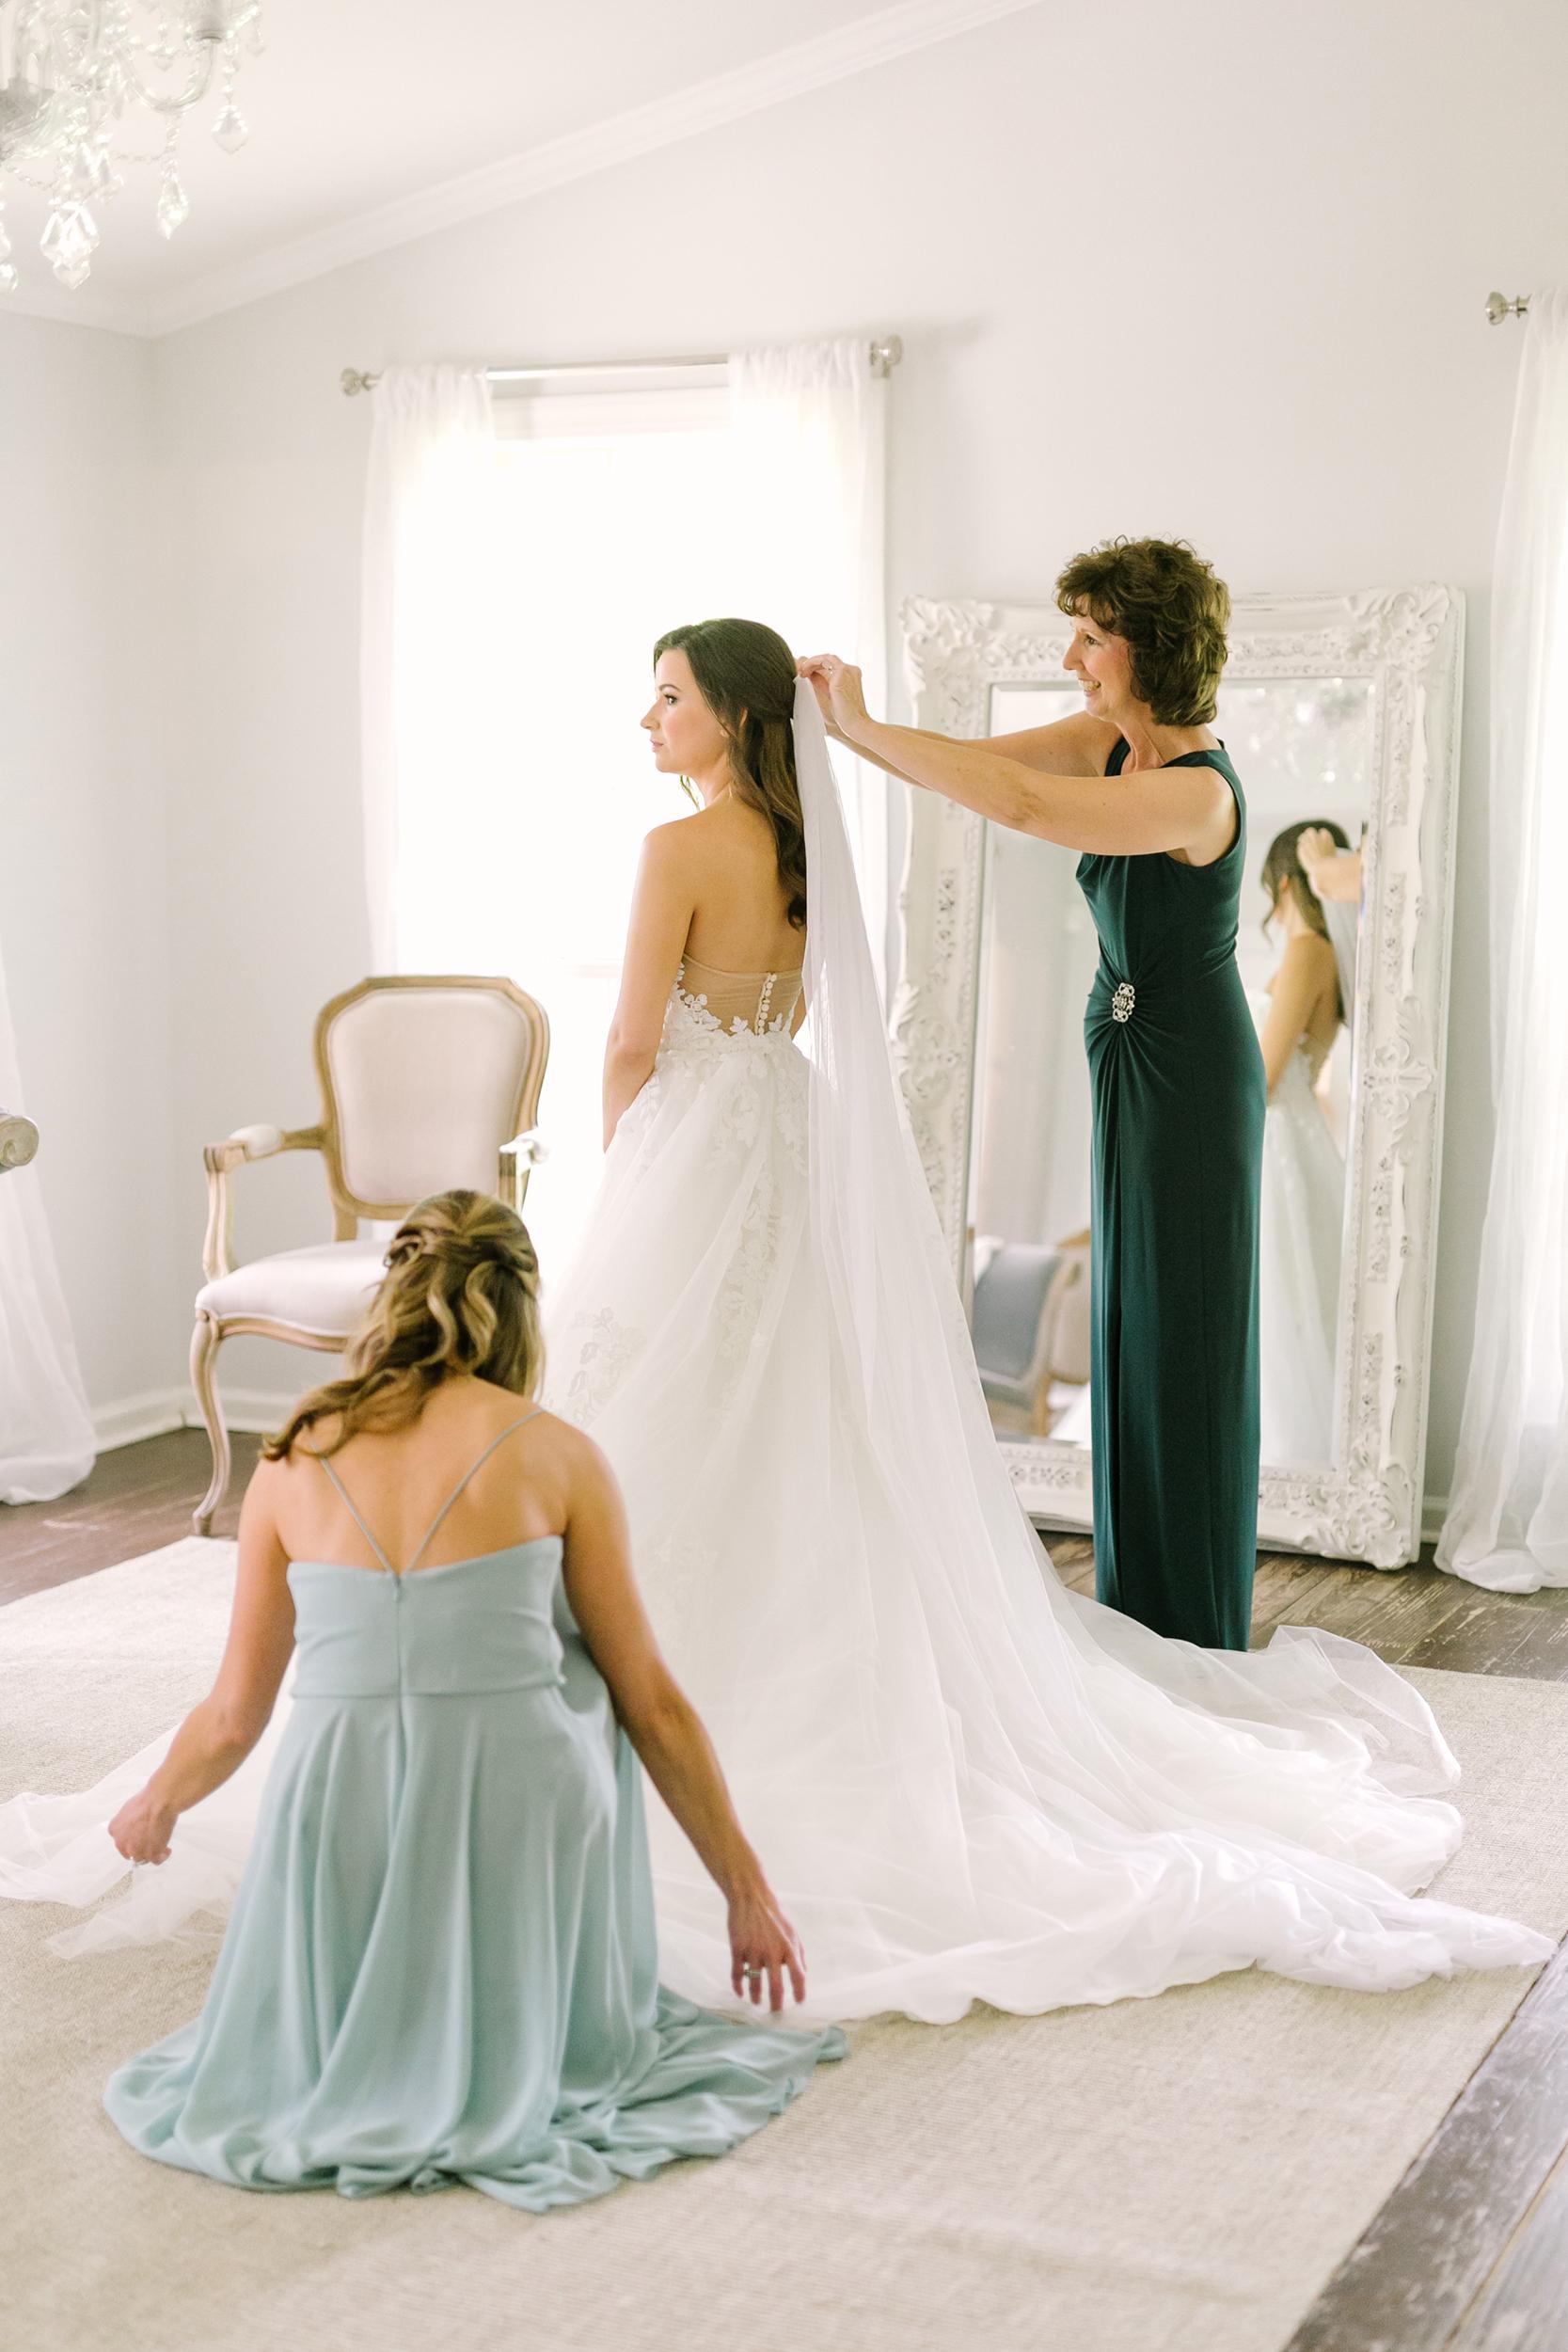 Austin_Wedding_Photographer_Kimberly_Brooke_Photographic_074.jpg